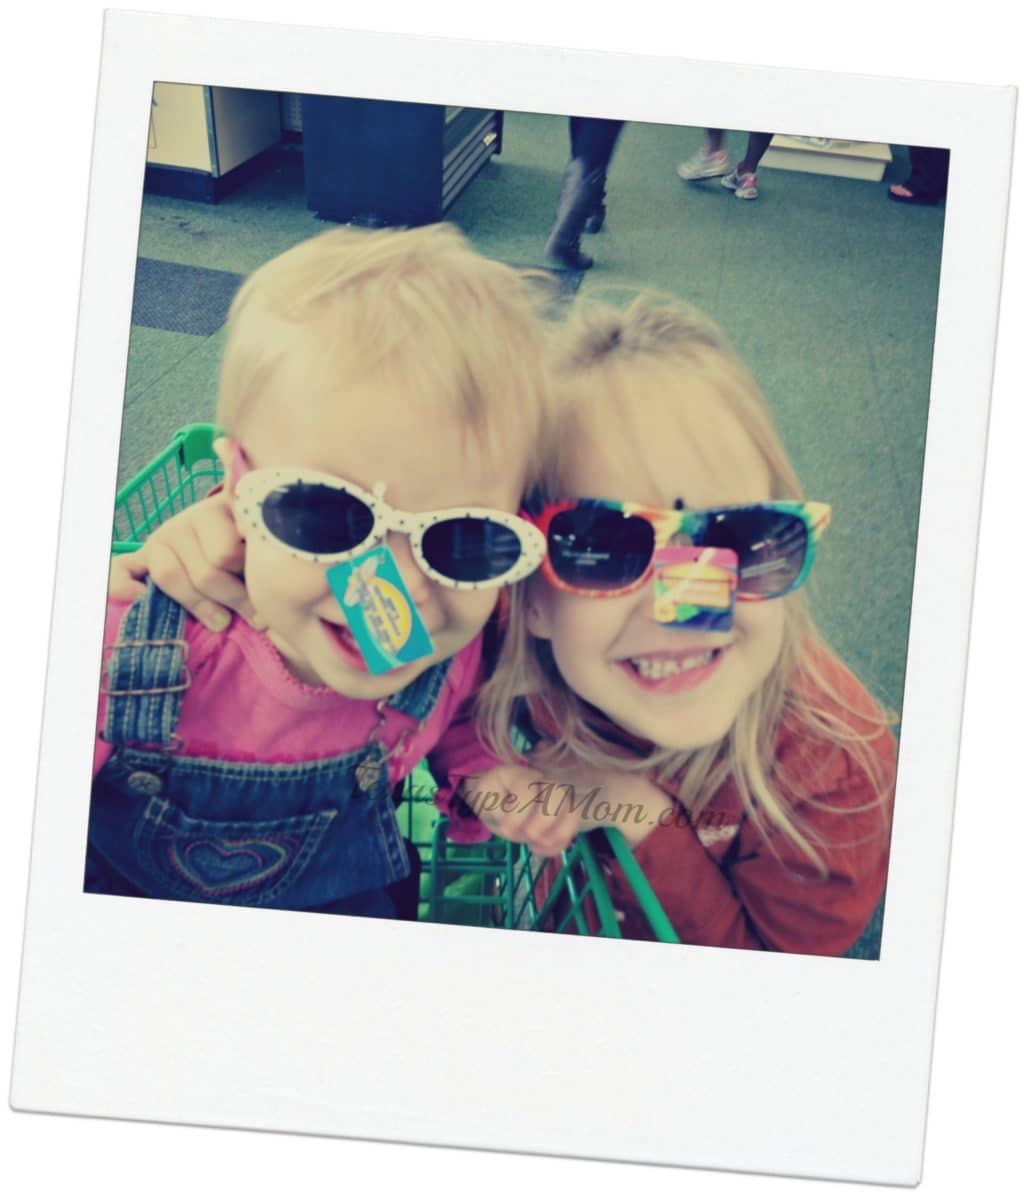 Trying on Children's Sunglasses